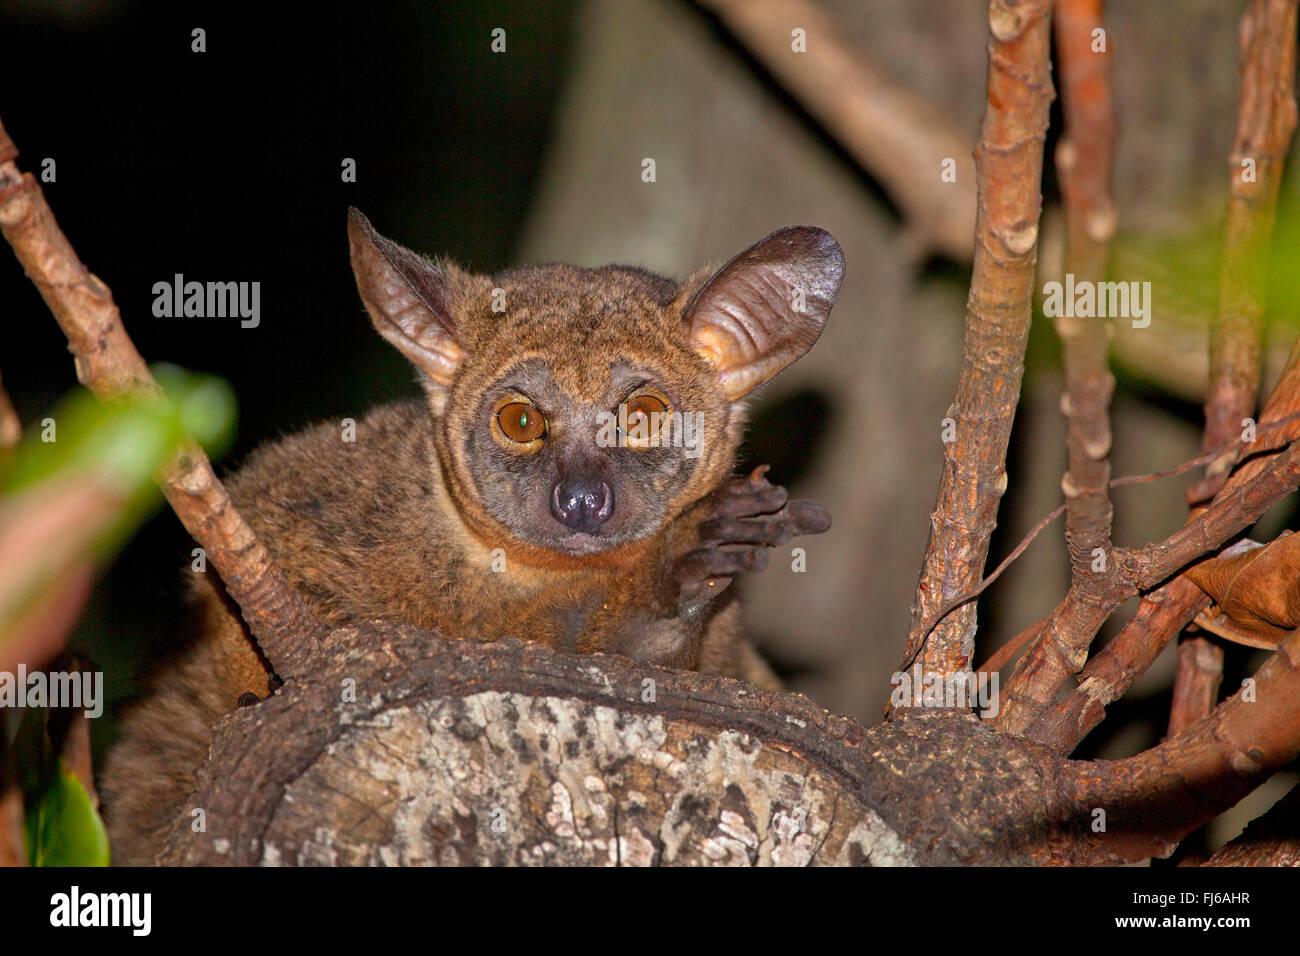 Senegal bush baby, minor bush baby, Senegal galago (Galago senegalensis), seduto su un ramo, di sera, Sud Africa Immagini Stock